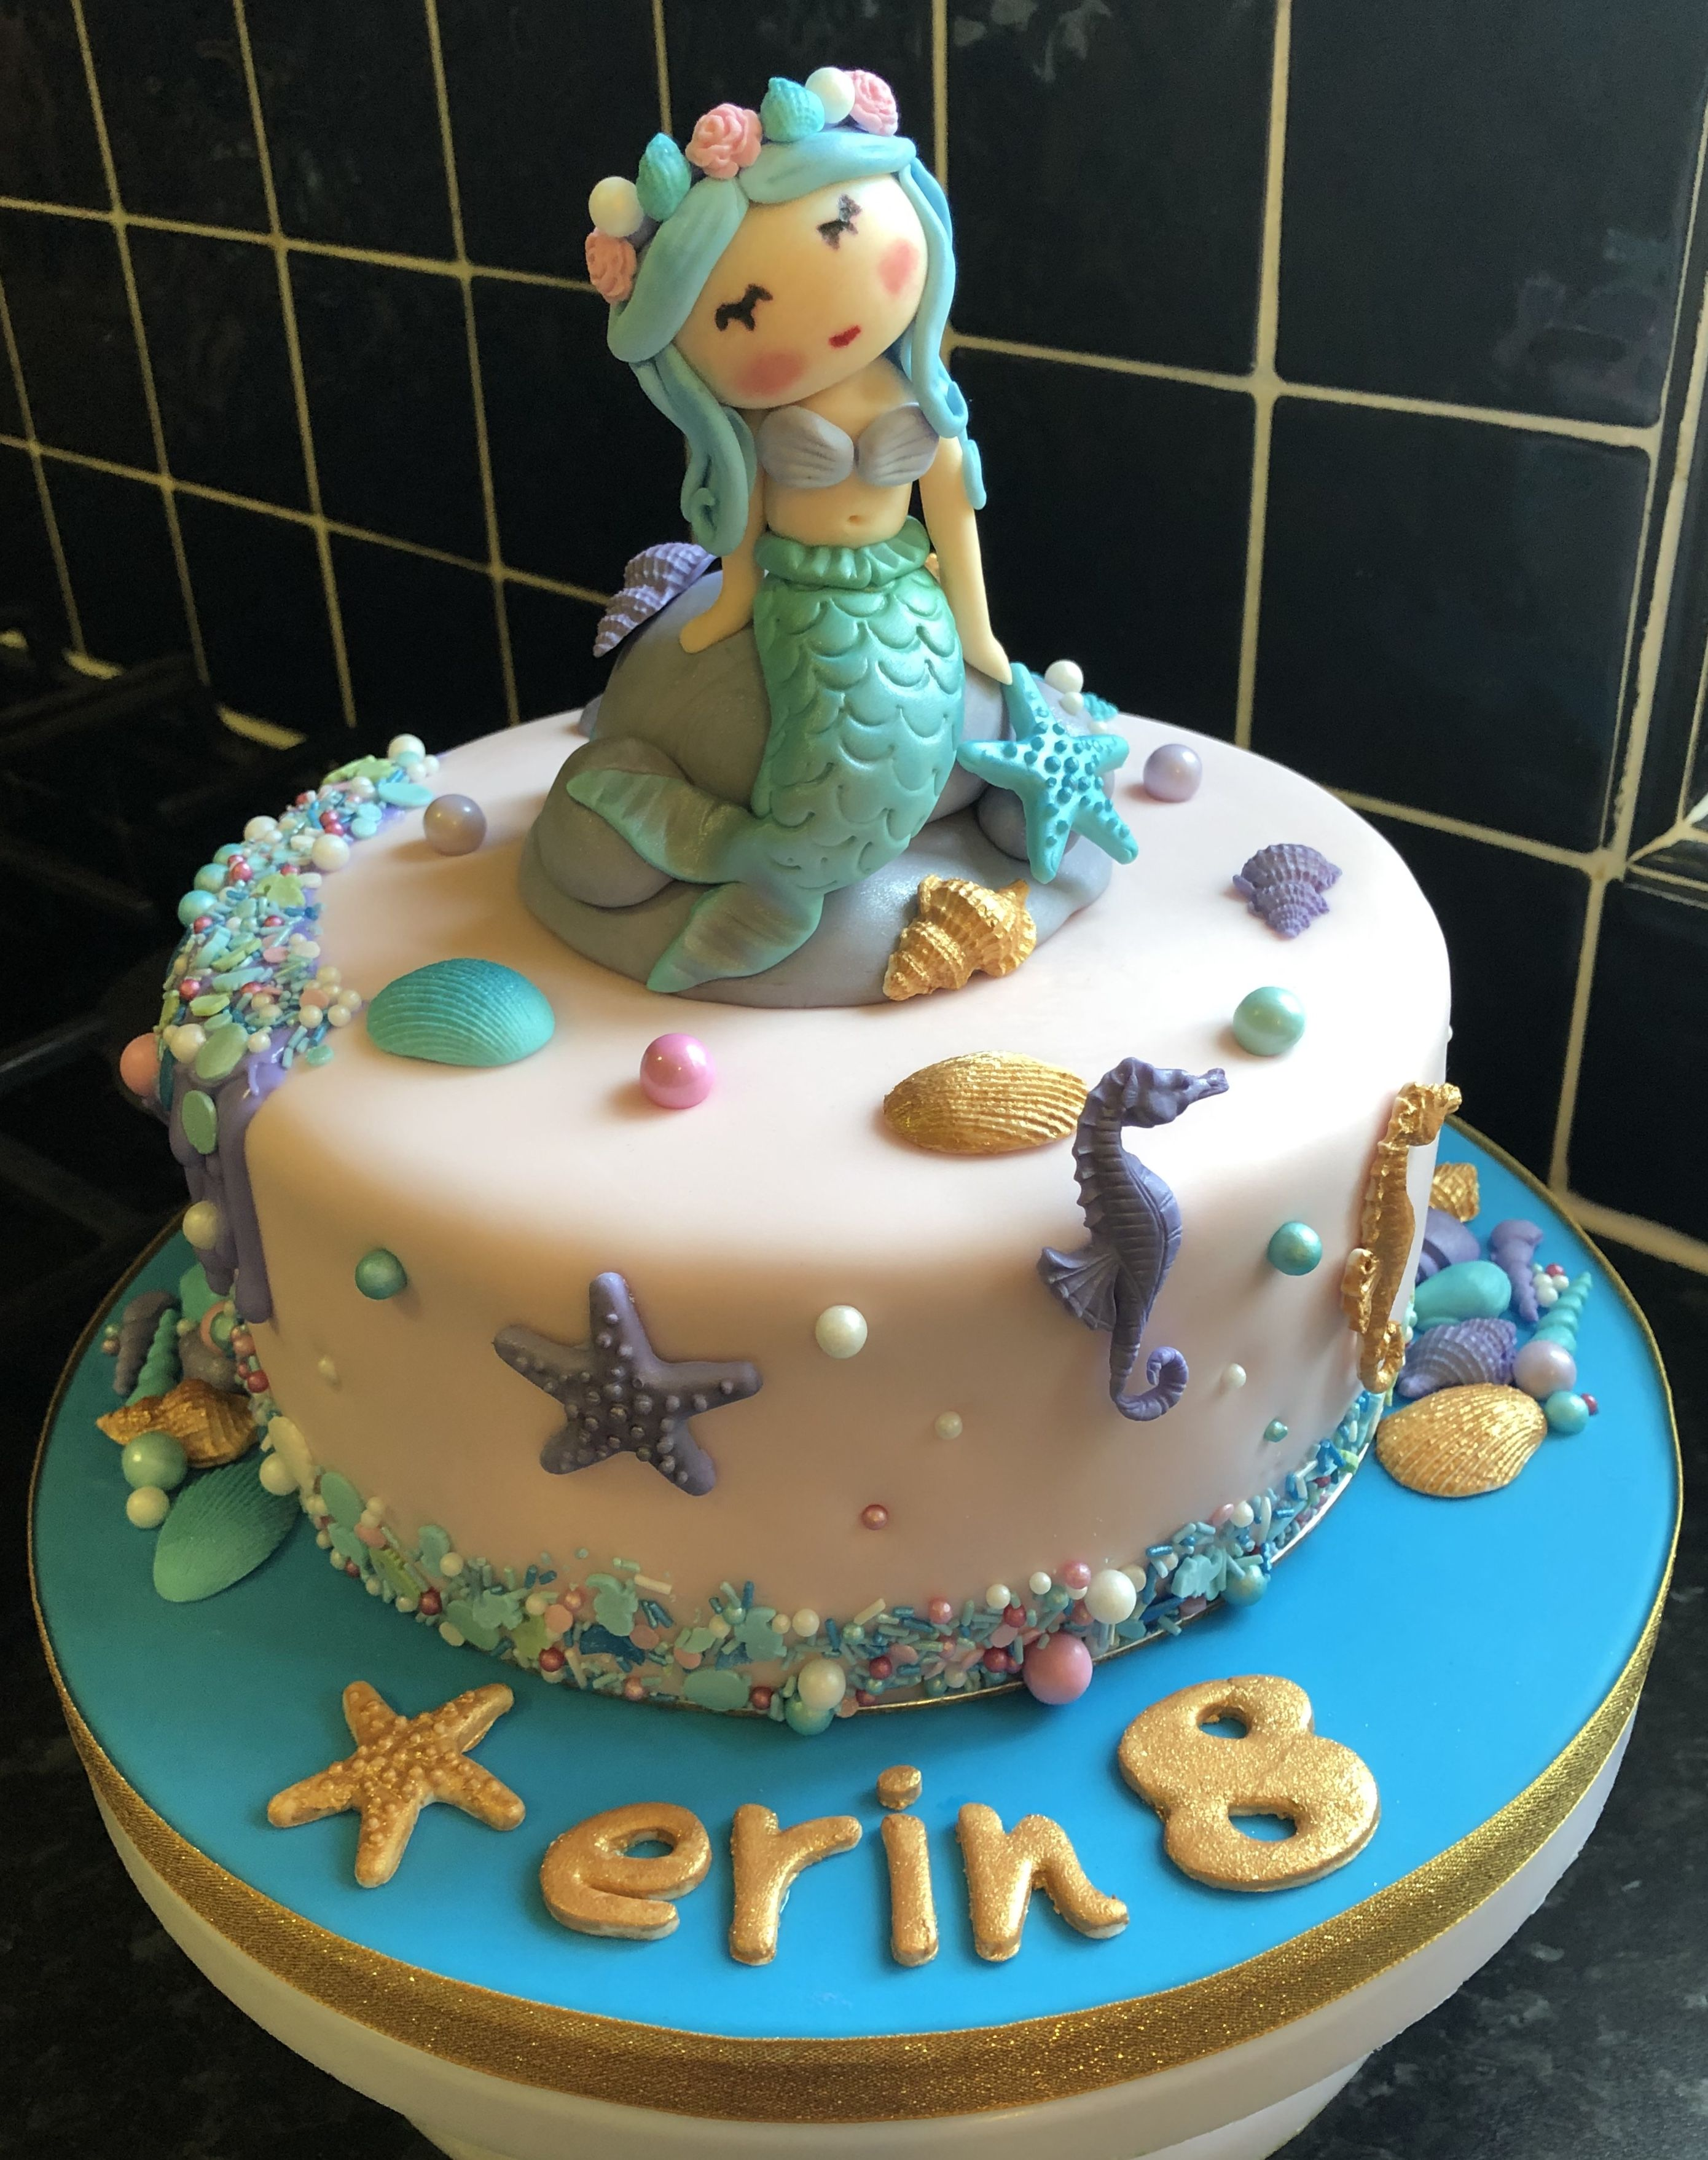 Mermaid birthday cake with images mermaid birthday